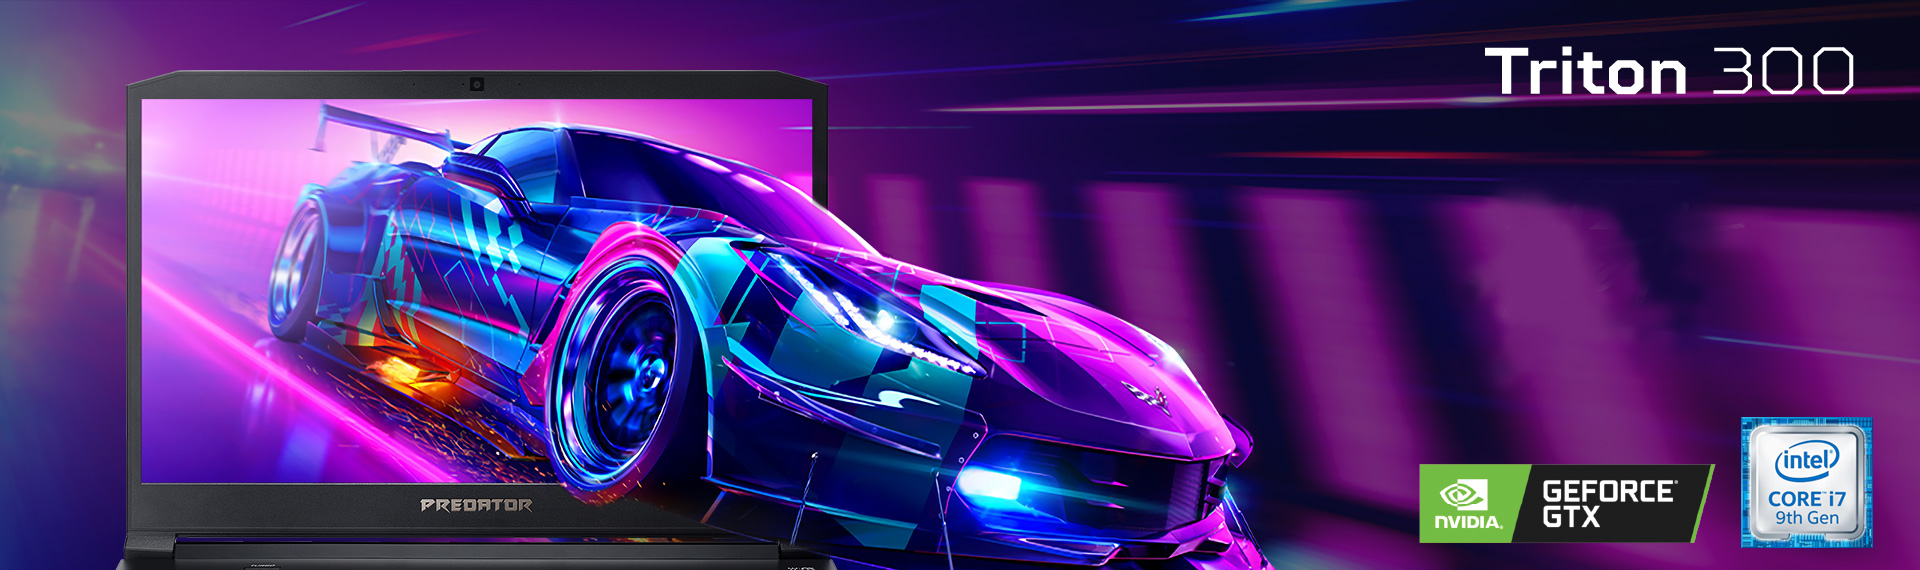 5 Alasan Kenapa Kamu Wajib Main Need for Speed Heat dengan Predator Triton 300